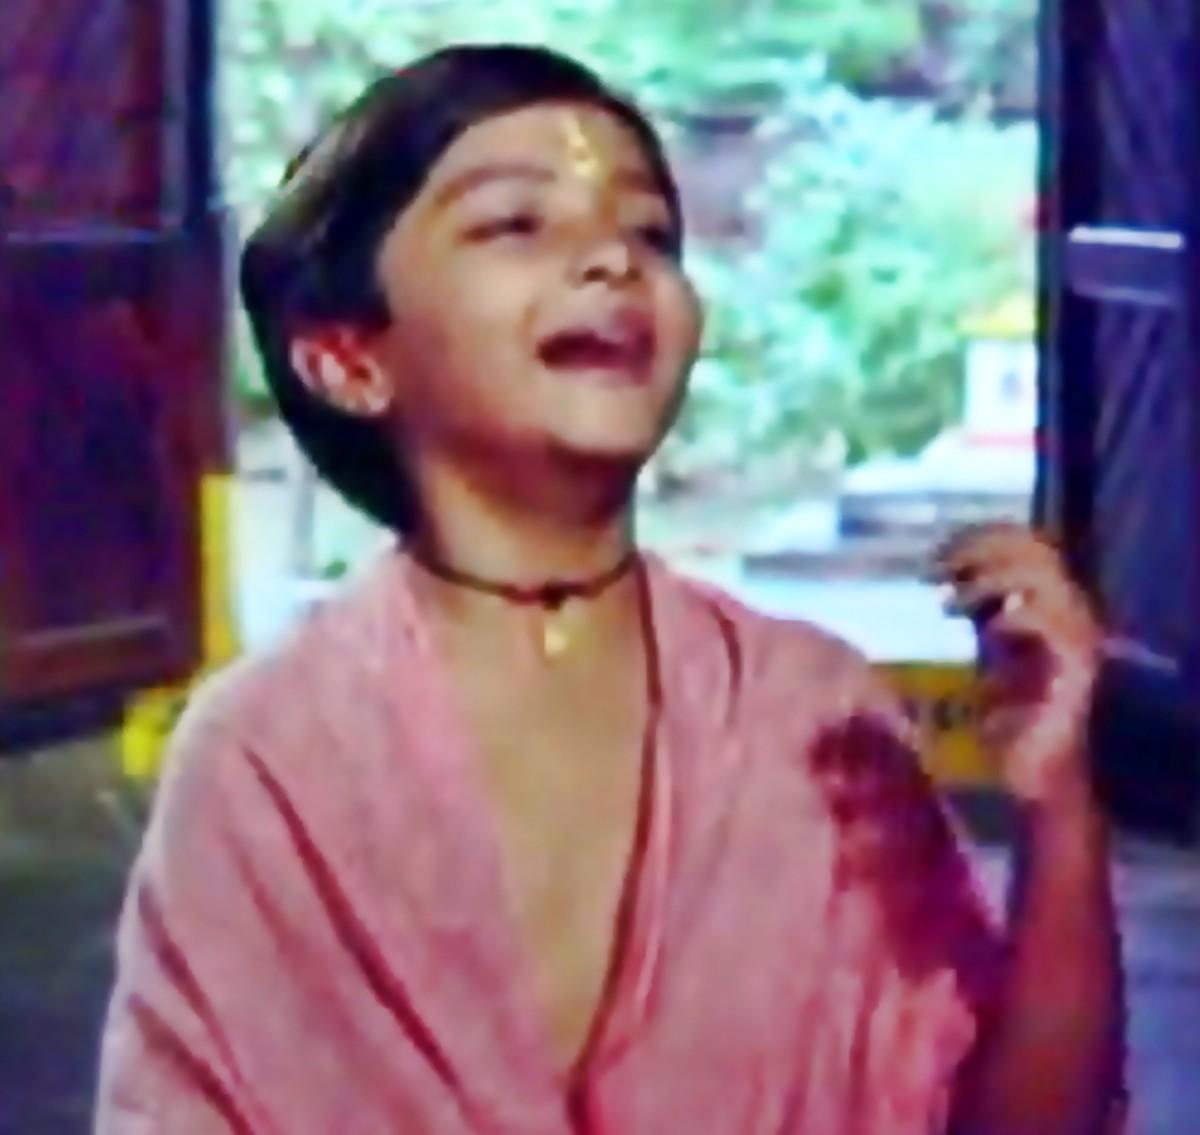 Jaoon tore charan kamal par vaari - Perhaps the greatest classical song of Bollywood in Raag Bhupali